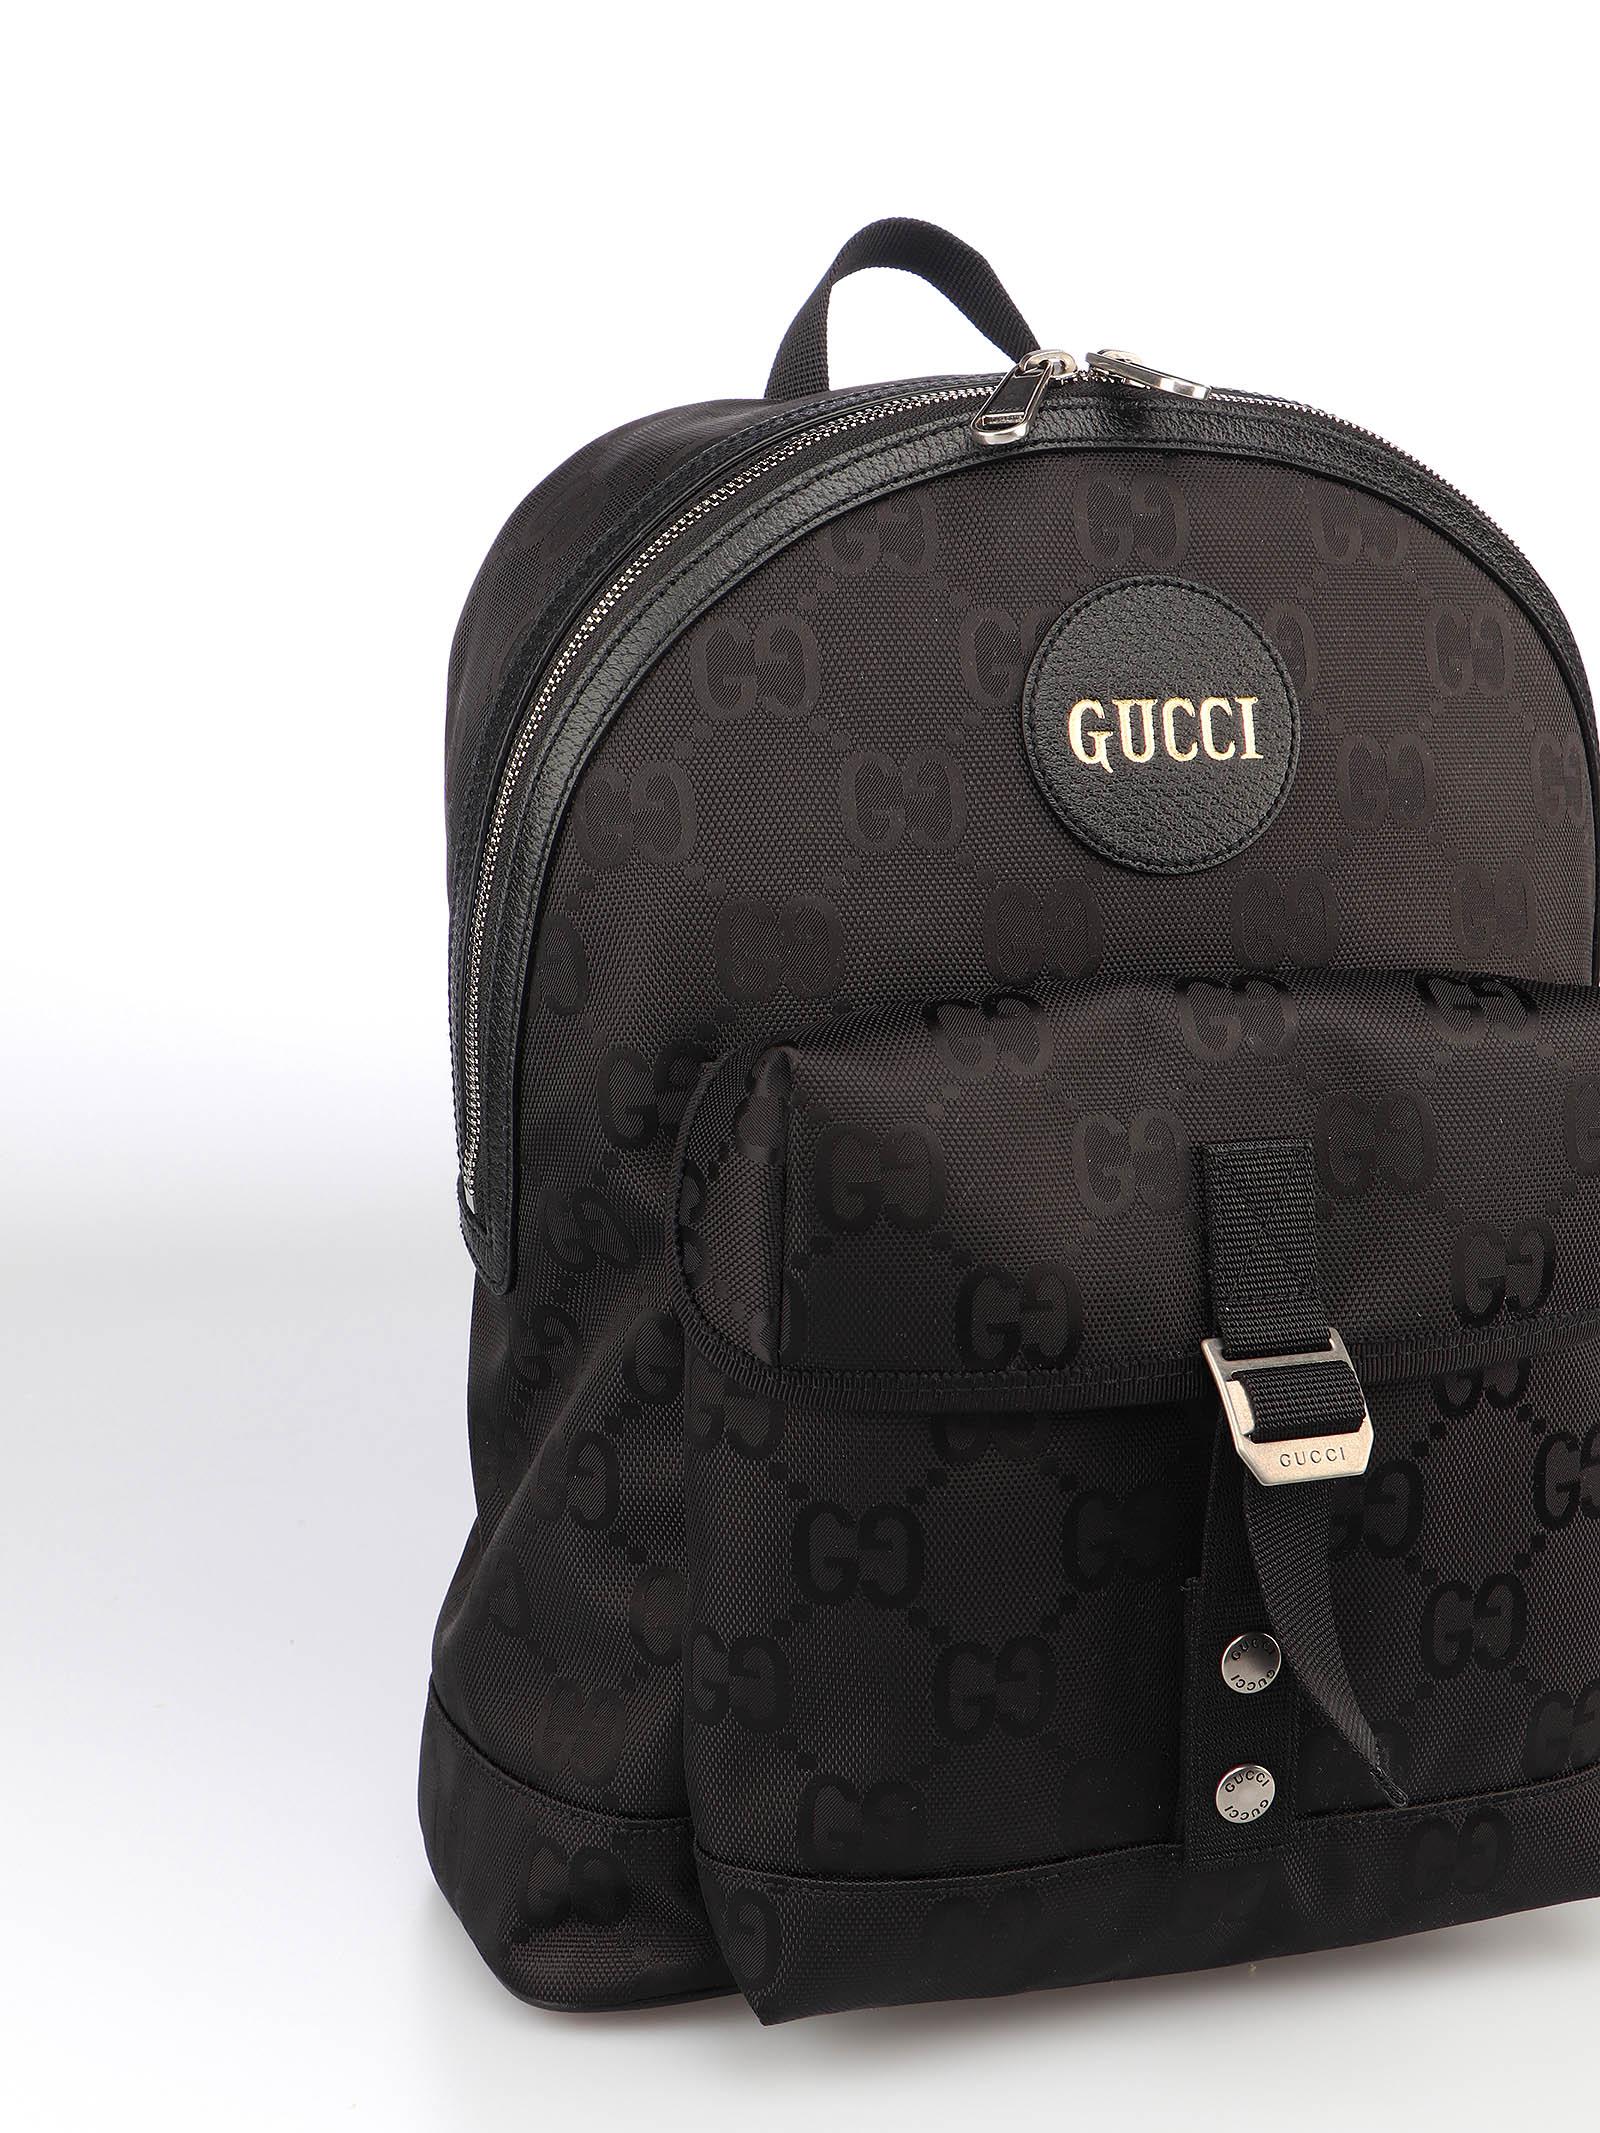 Immagine di Gucci | Gucci Off The Grid Backpack